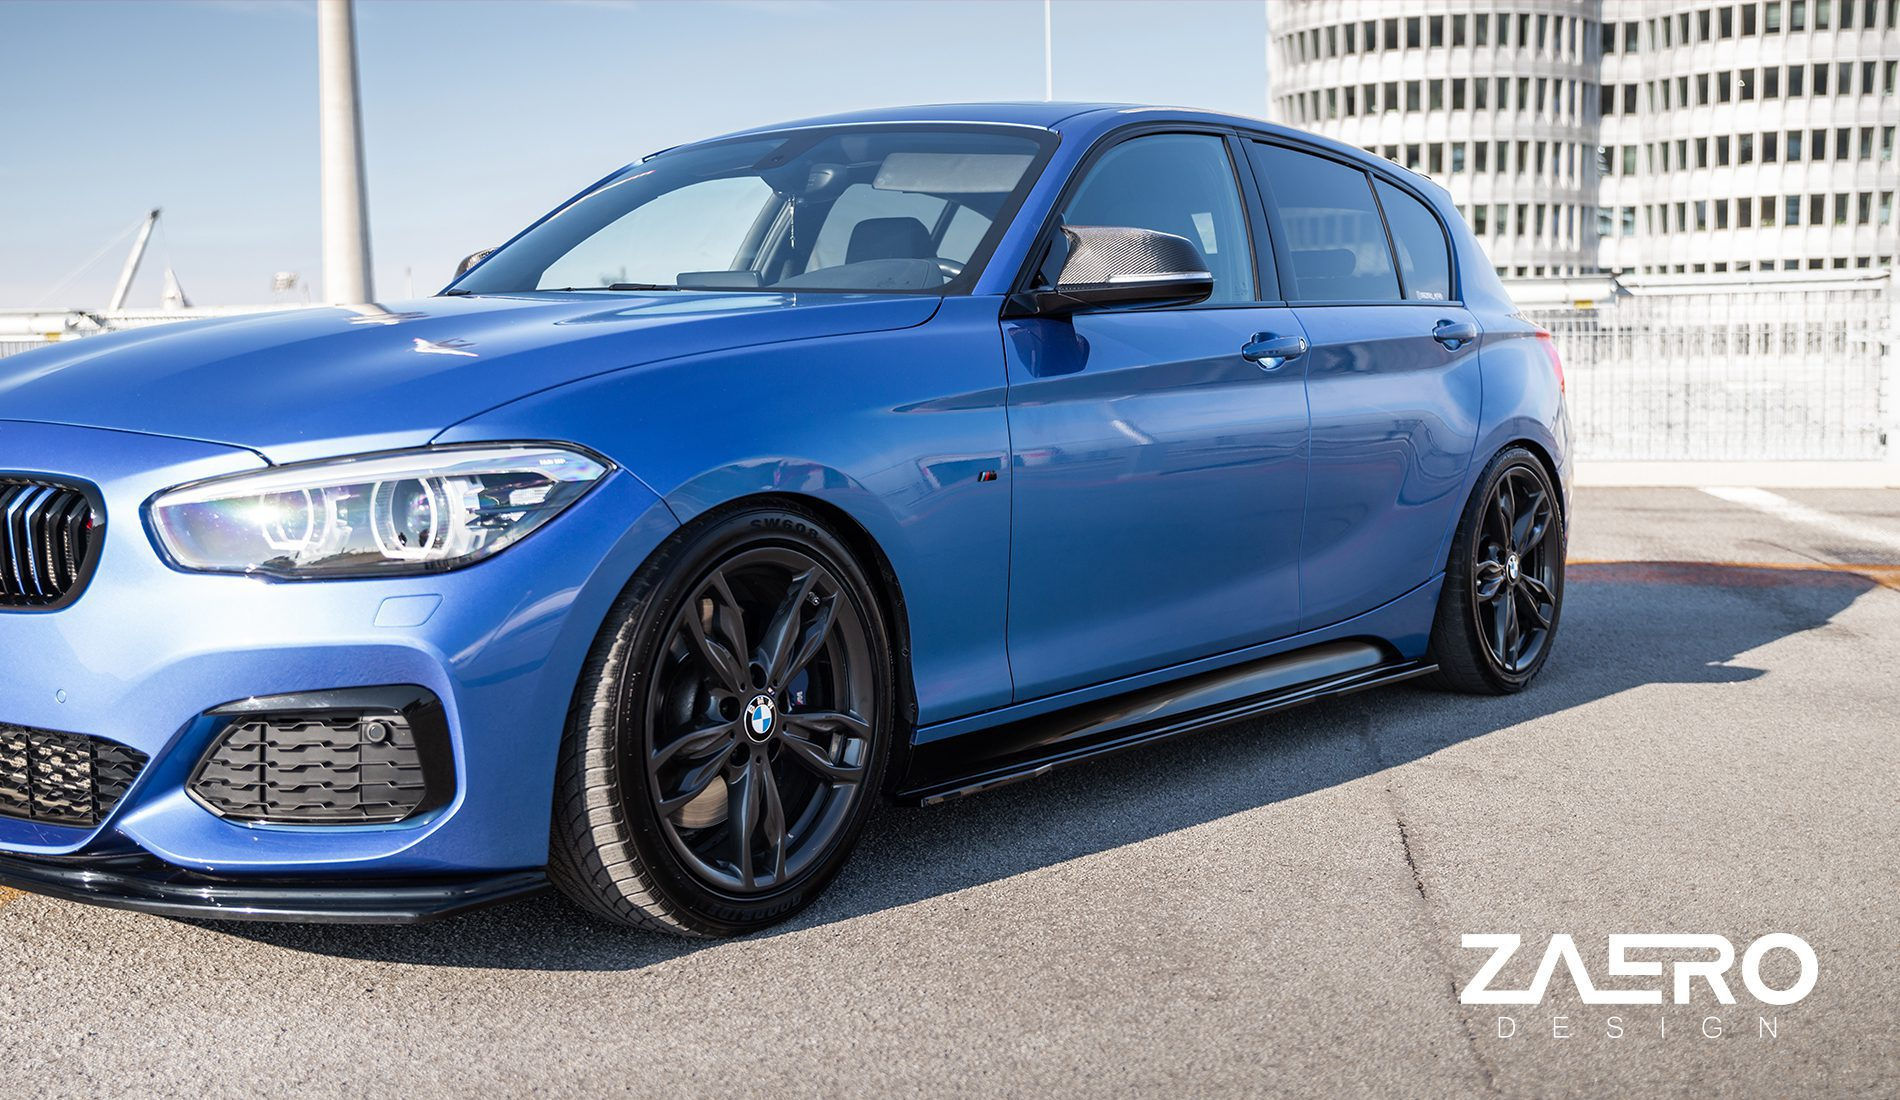 ZAERO-DESIGN-EVO-1-SIDE-SKIRT-EXTENSION-FOR-BMW-1-SERIES-116i-118i-120i-125i-M135-M140-F20-F21-LCI-SPOILER-BODYKIT